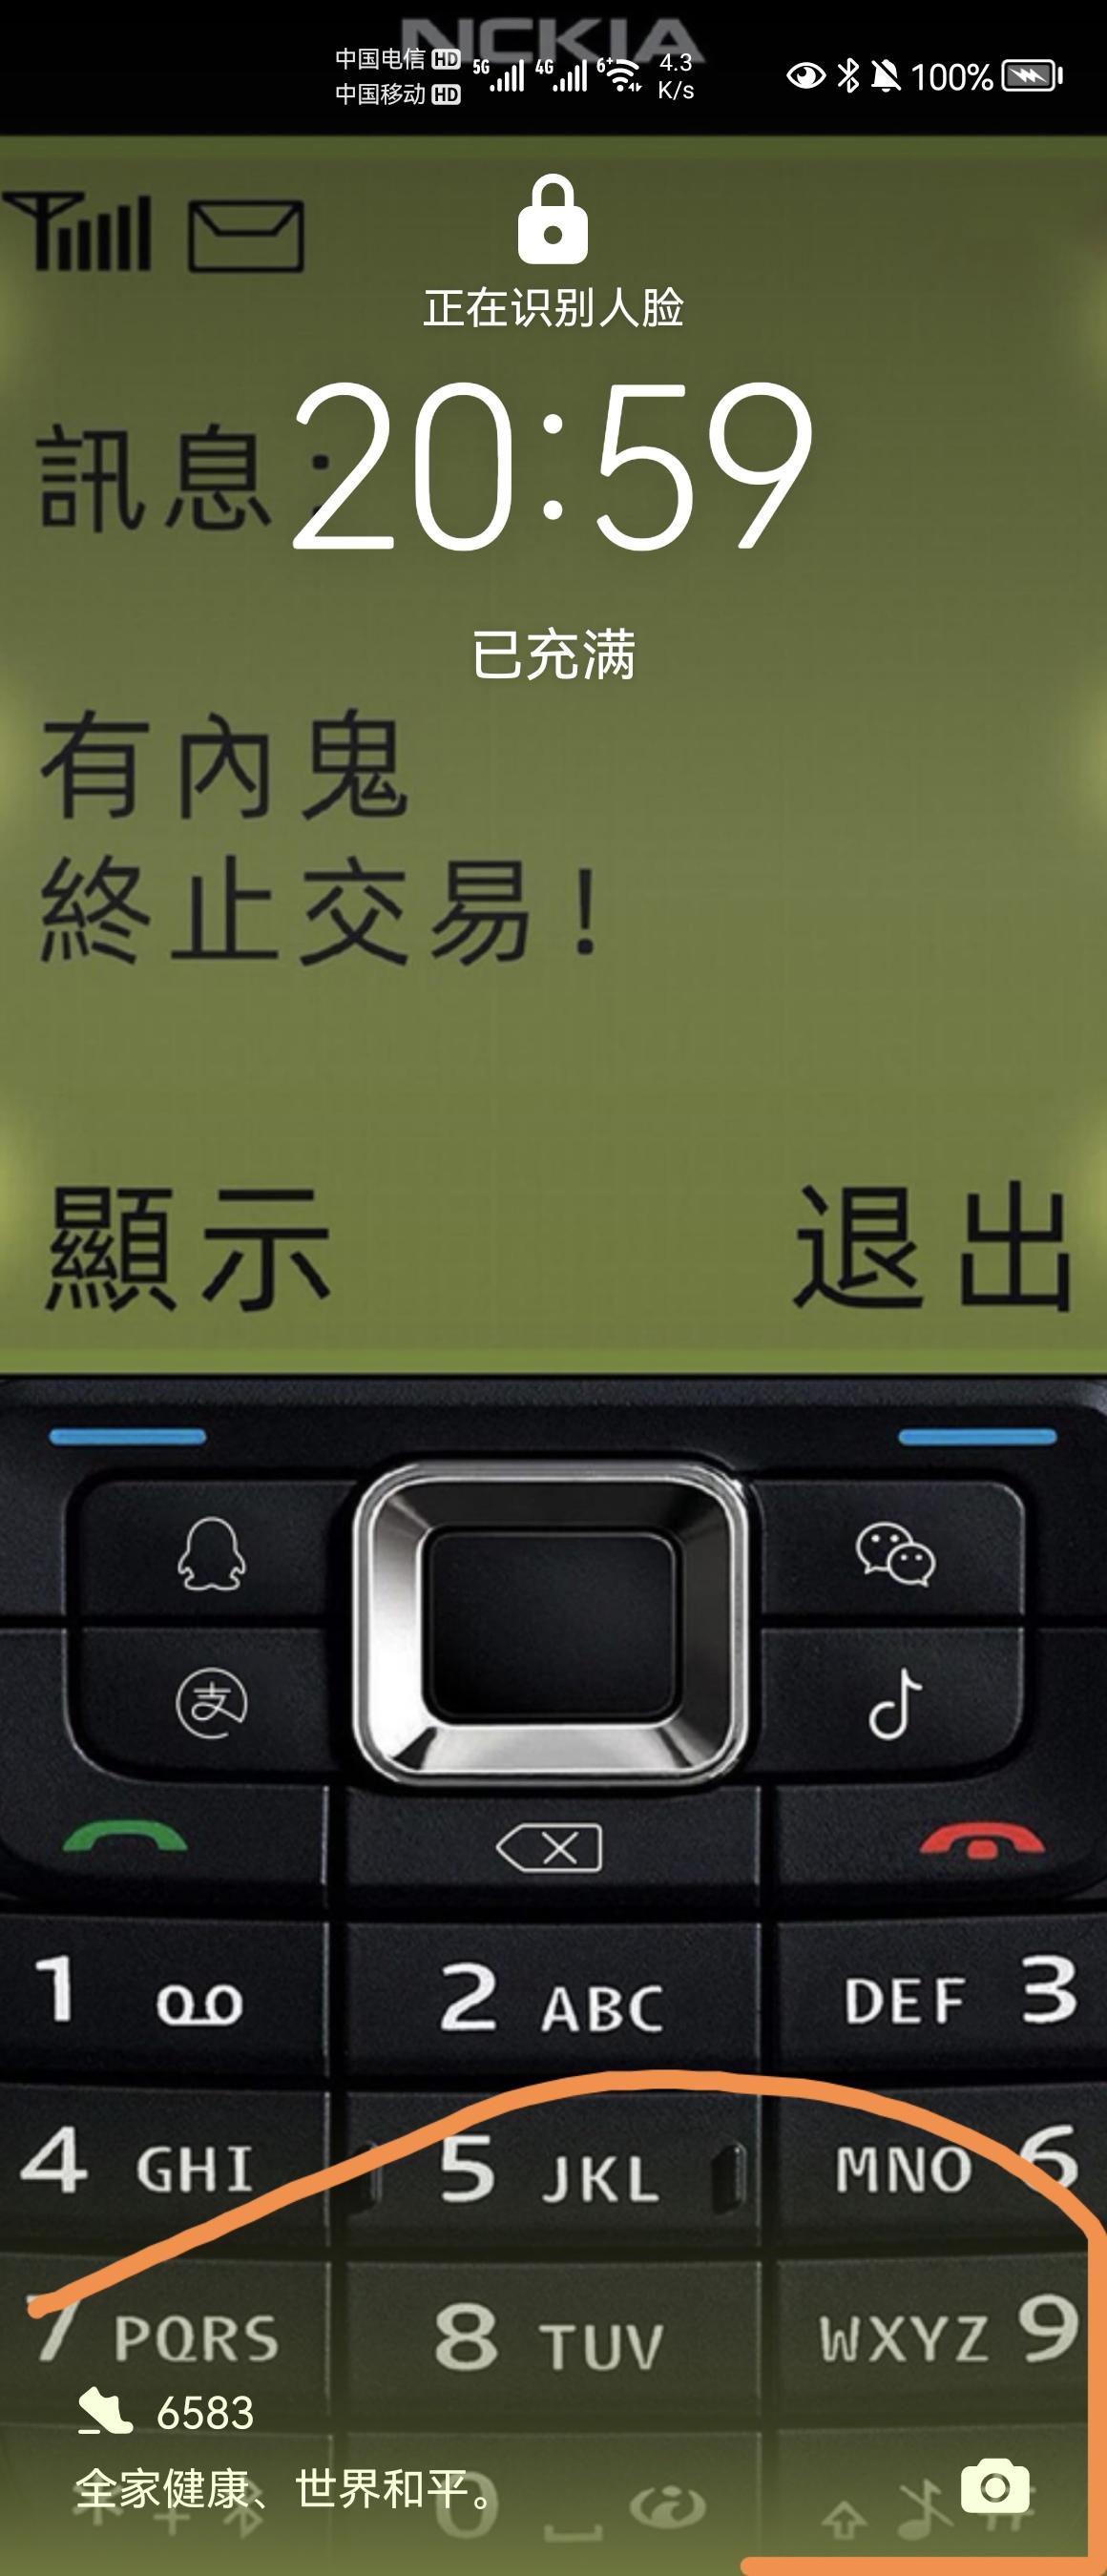 Screenshot_20210919_205949_com.android.keyguard_edit_270790394812844.jpg